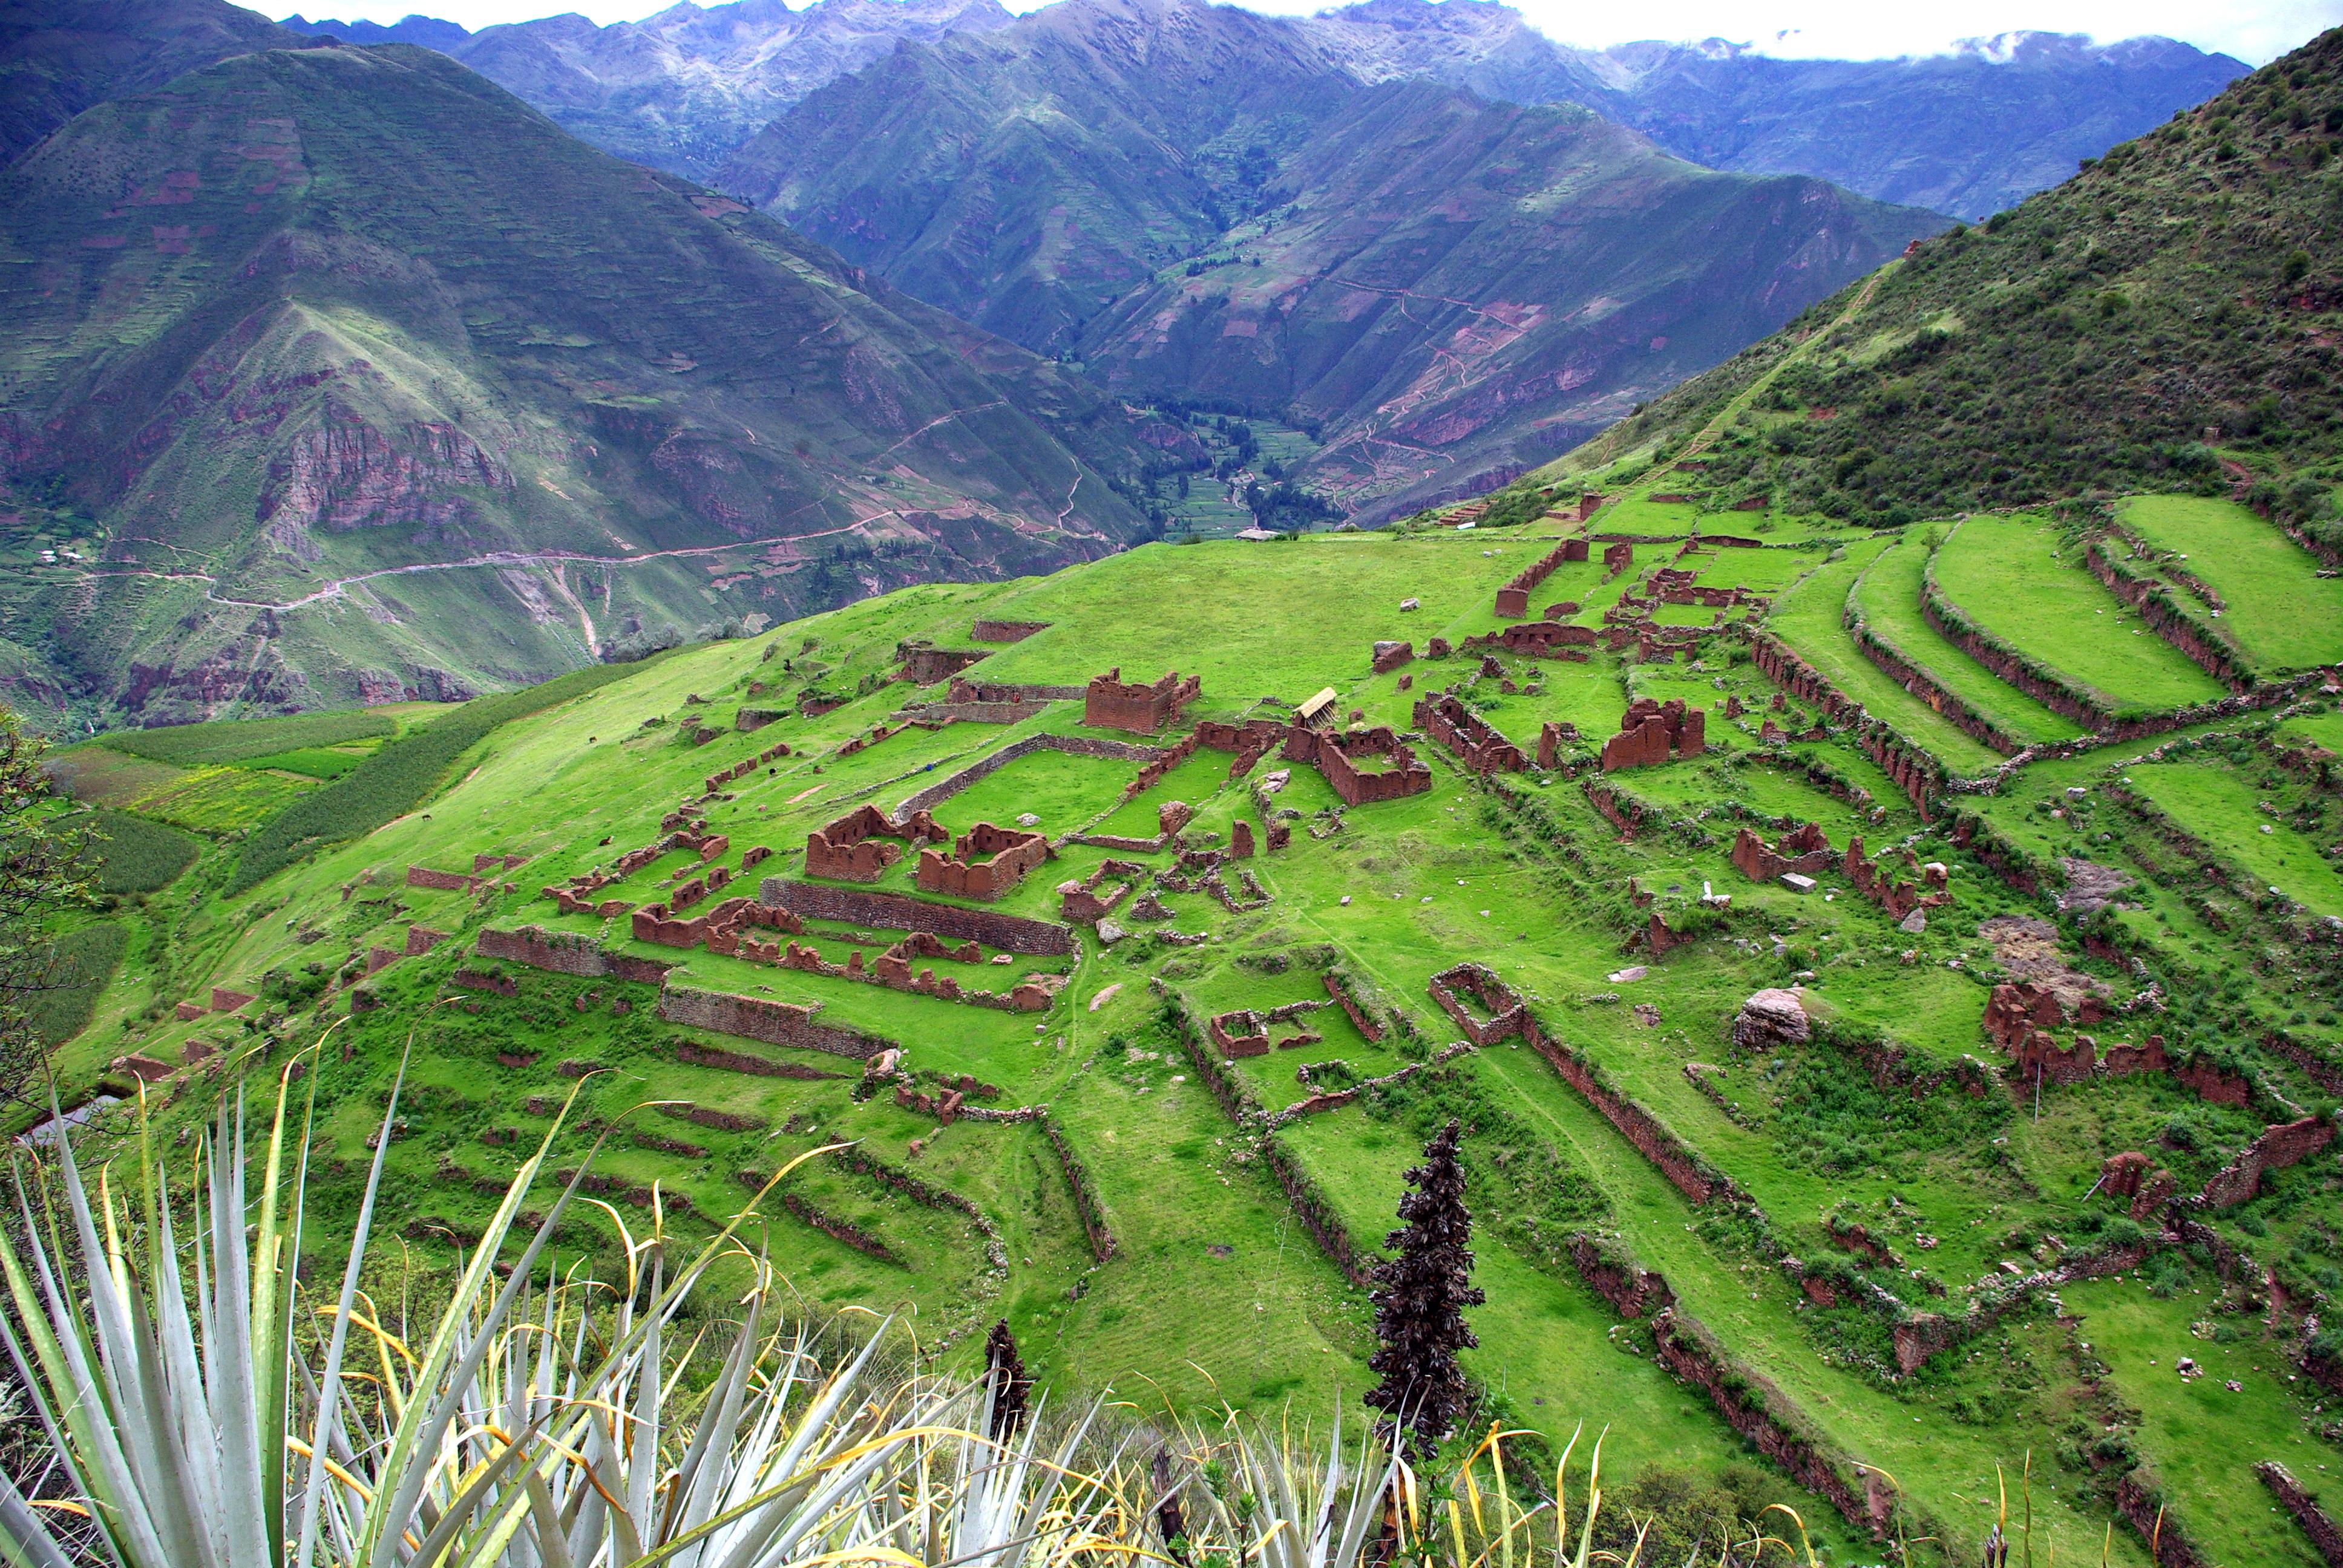 Huchuy Qosqo Cusco Stevage